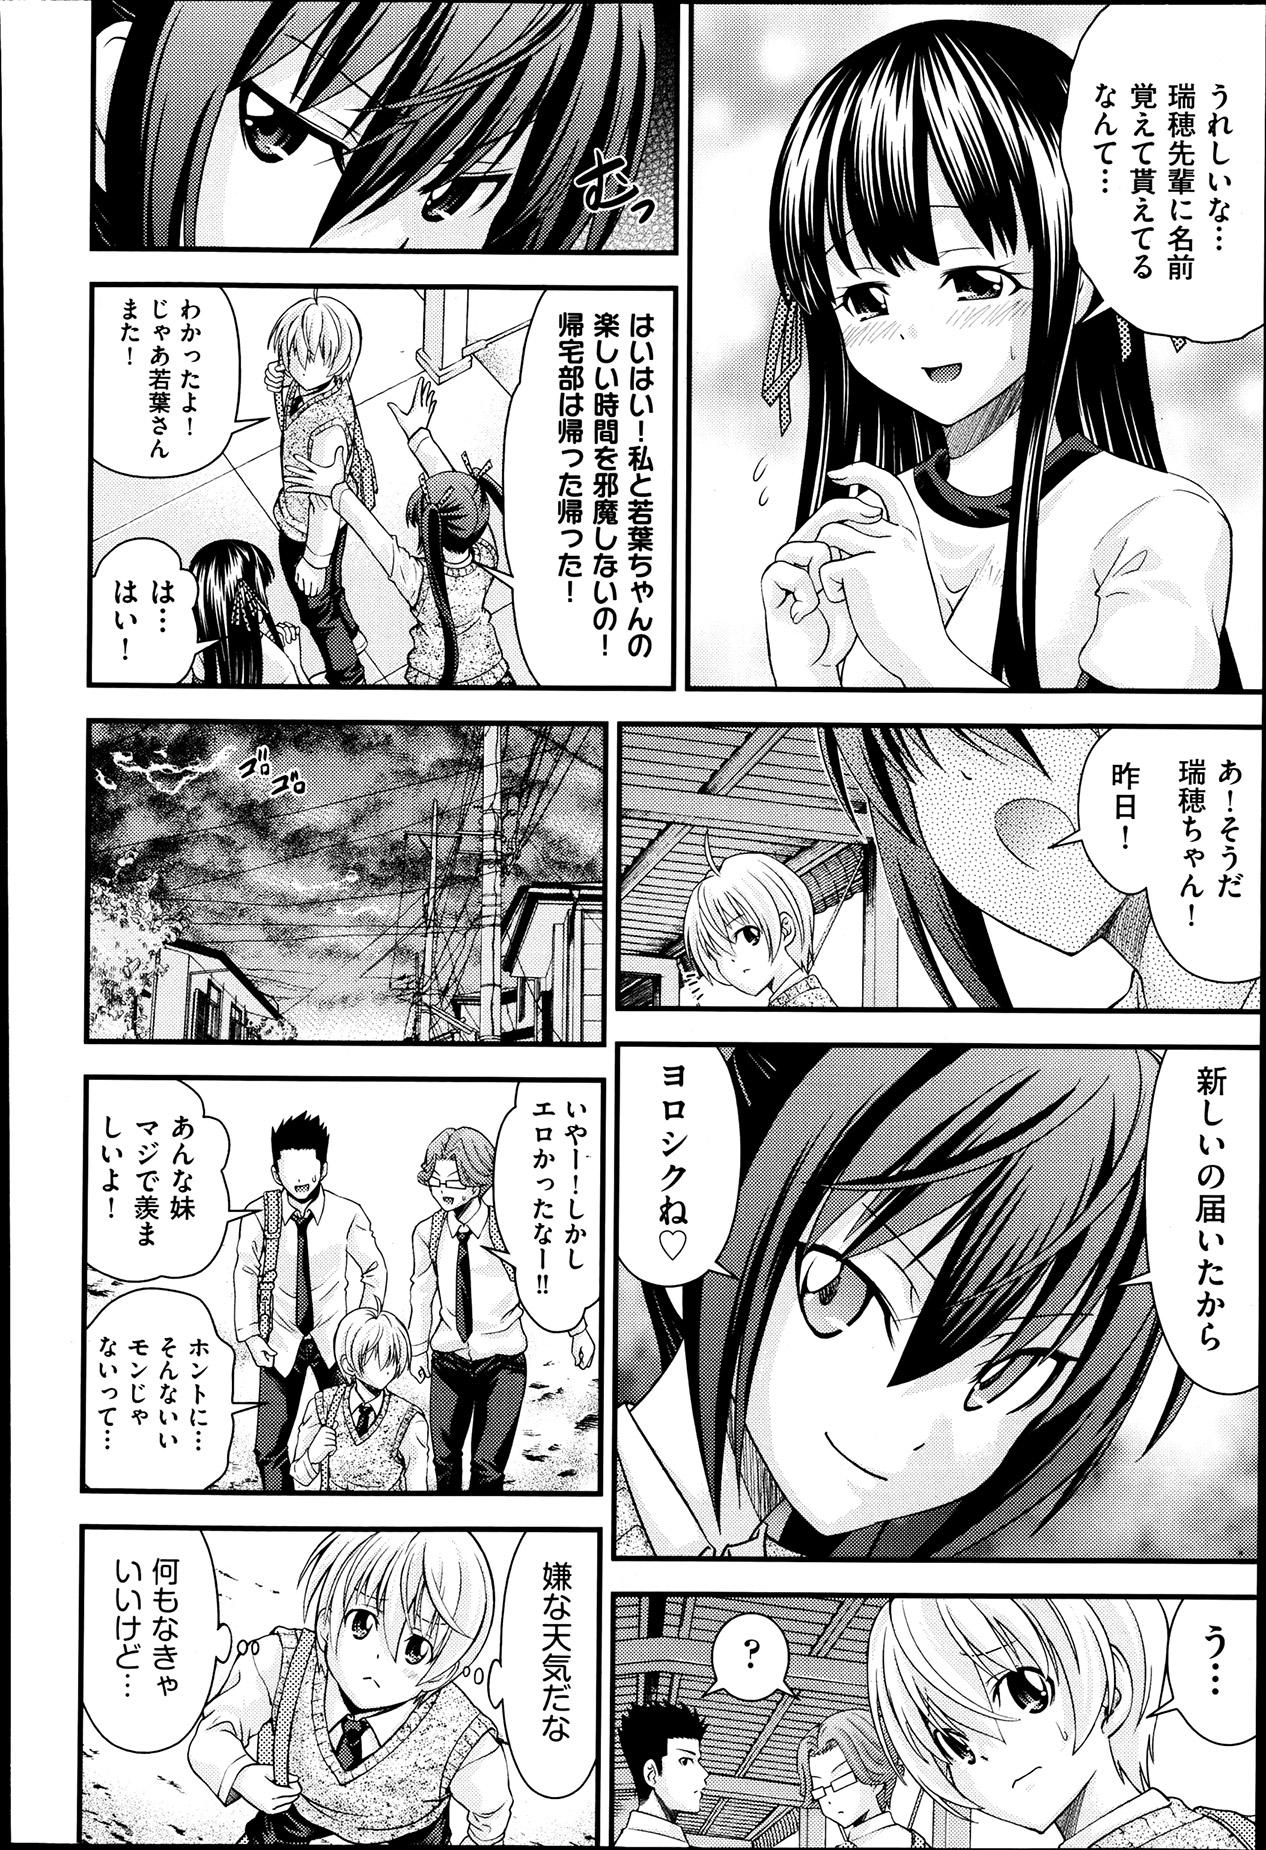 Kyoudai Replace 7